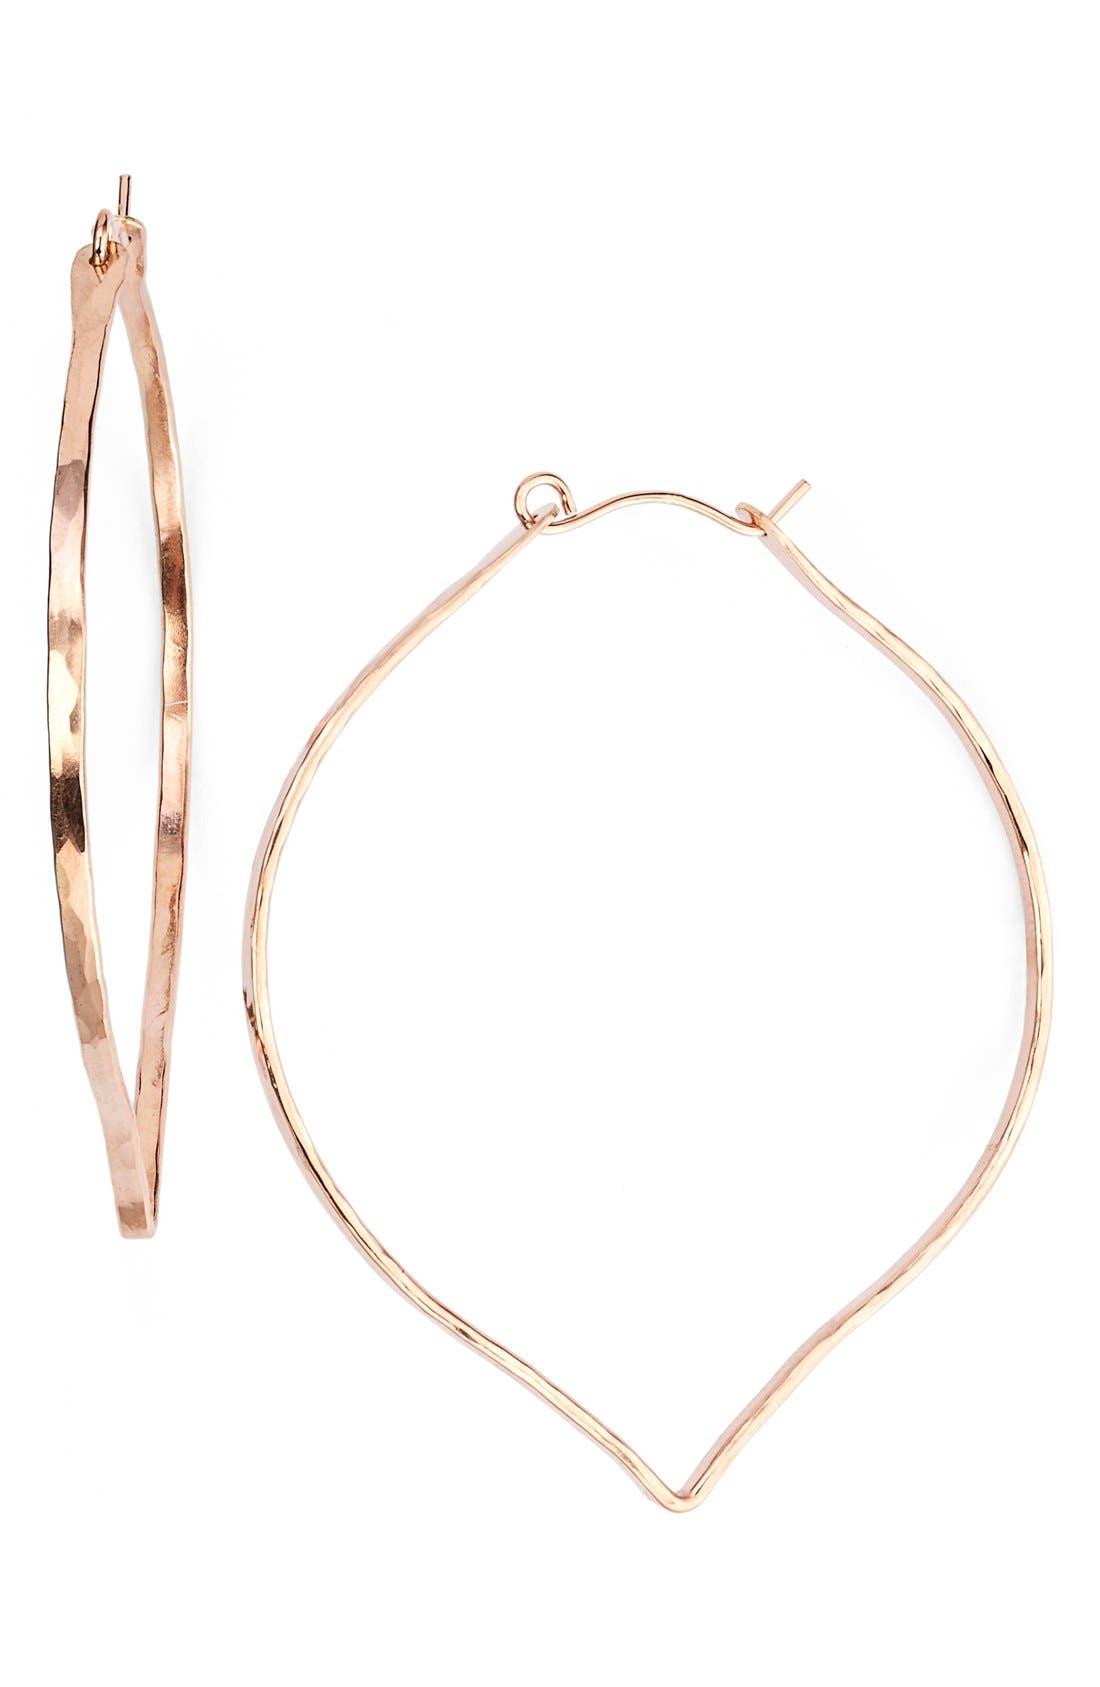 NASHELLE Ija Large 14k-Rose Gold Fill Lotus Hoop Earrings